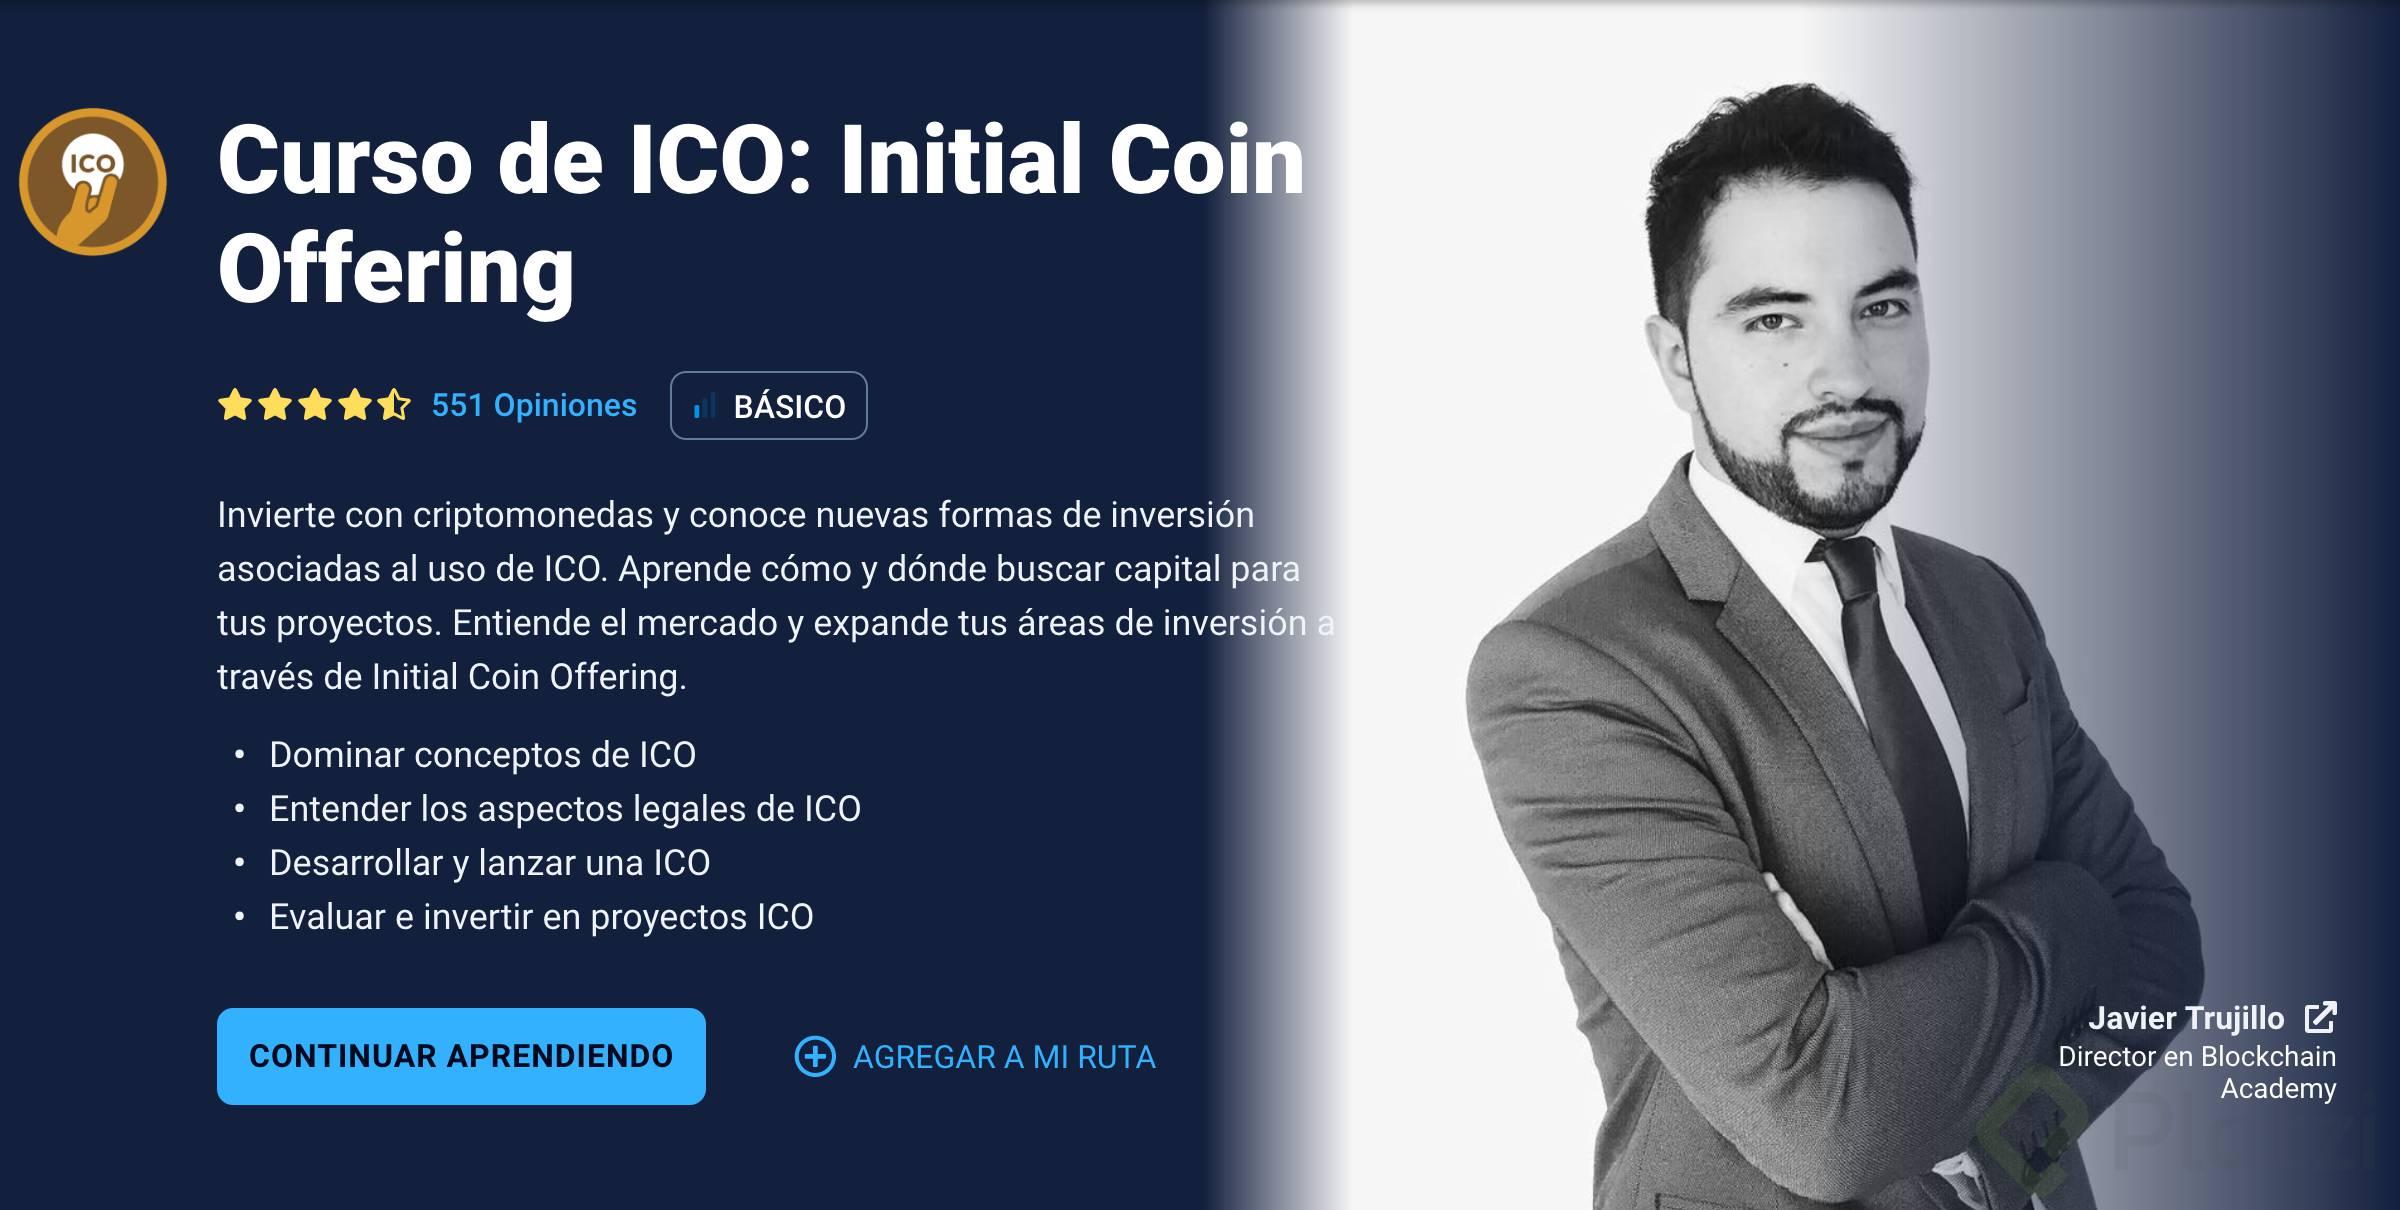 Curso de ICO Initial Coin Offering - Platzi.png